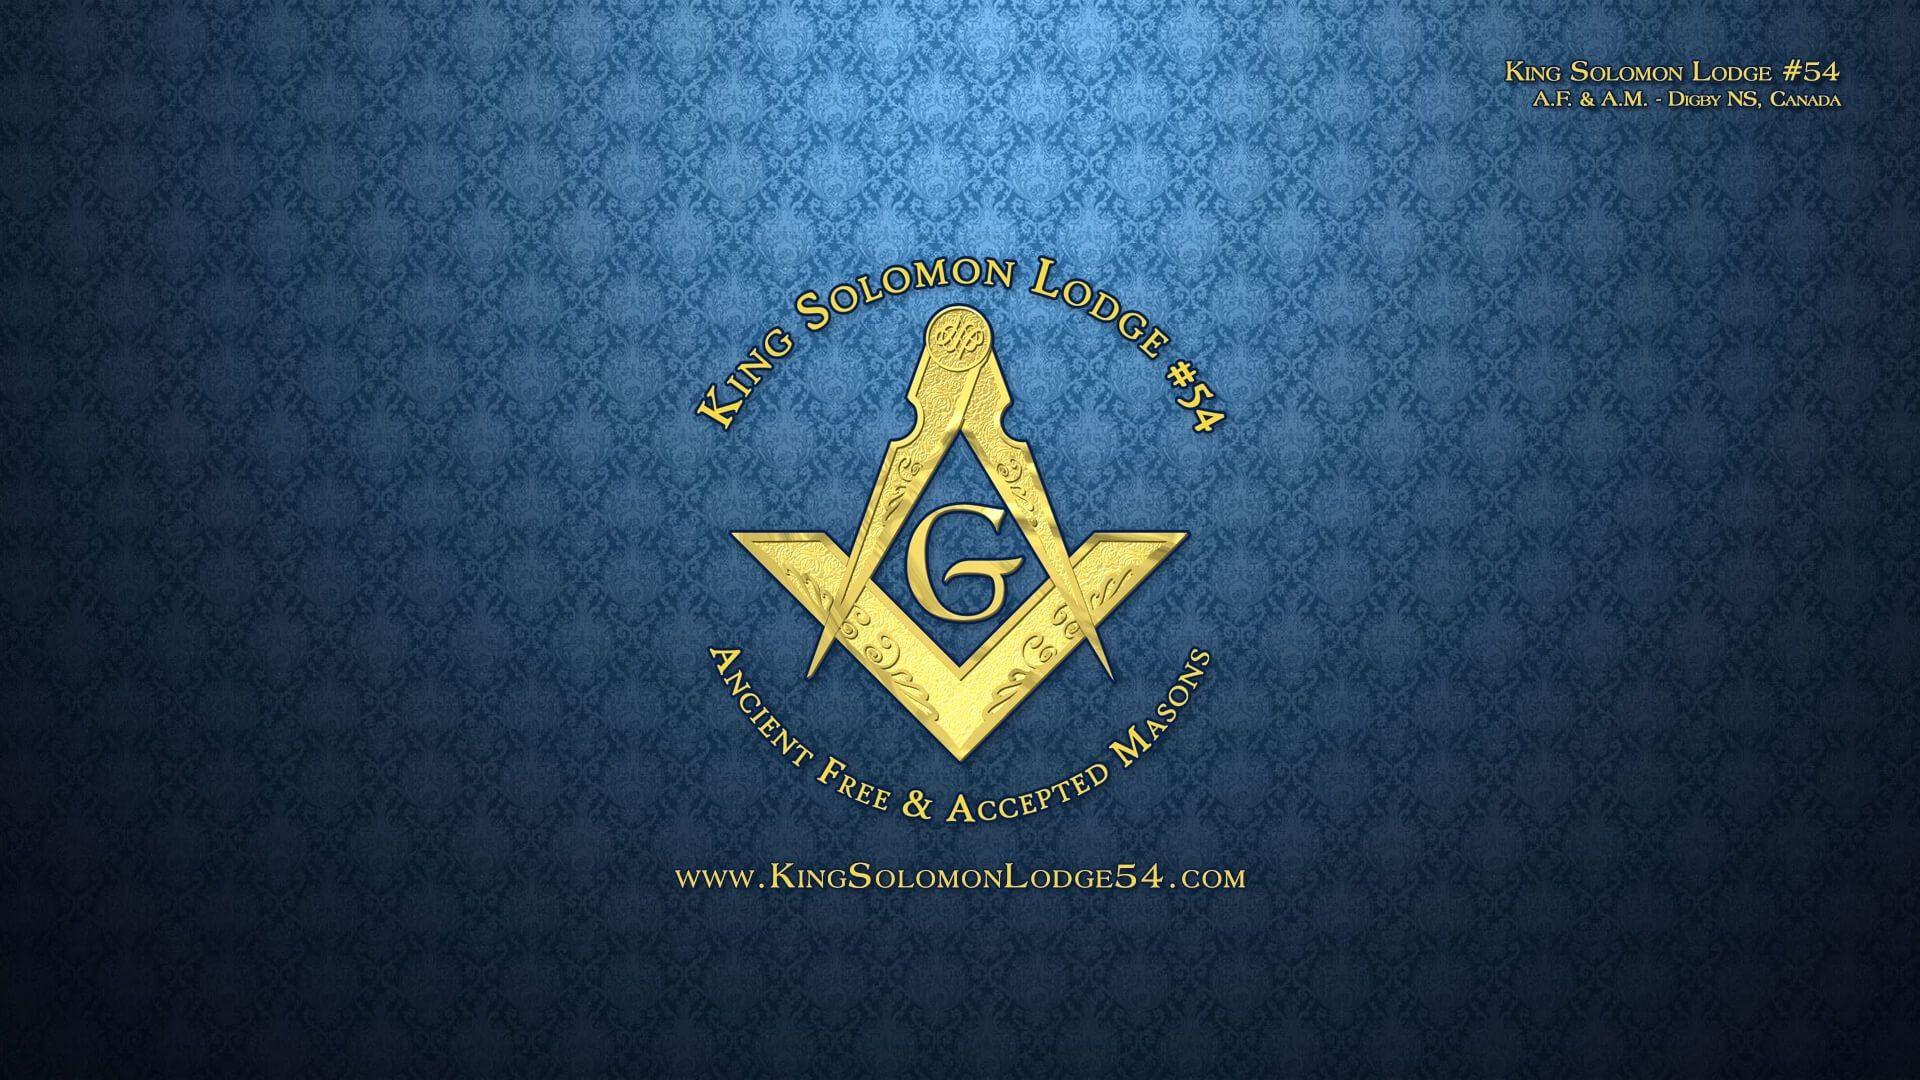 Masonic Wallpapers   Top Masonic Backgrounds   WallpaperAccess 1920x1080